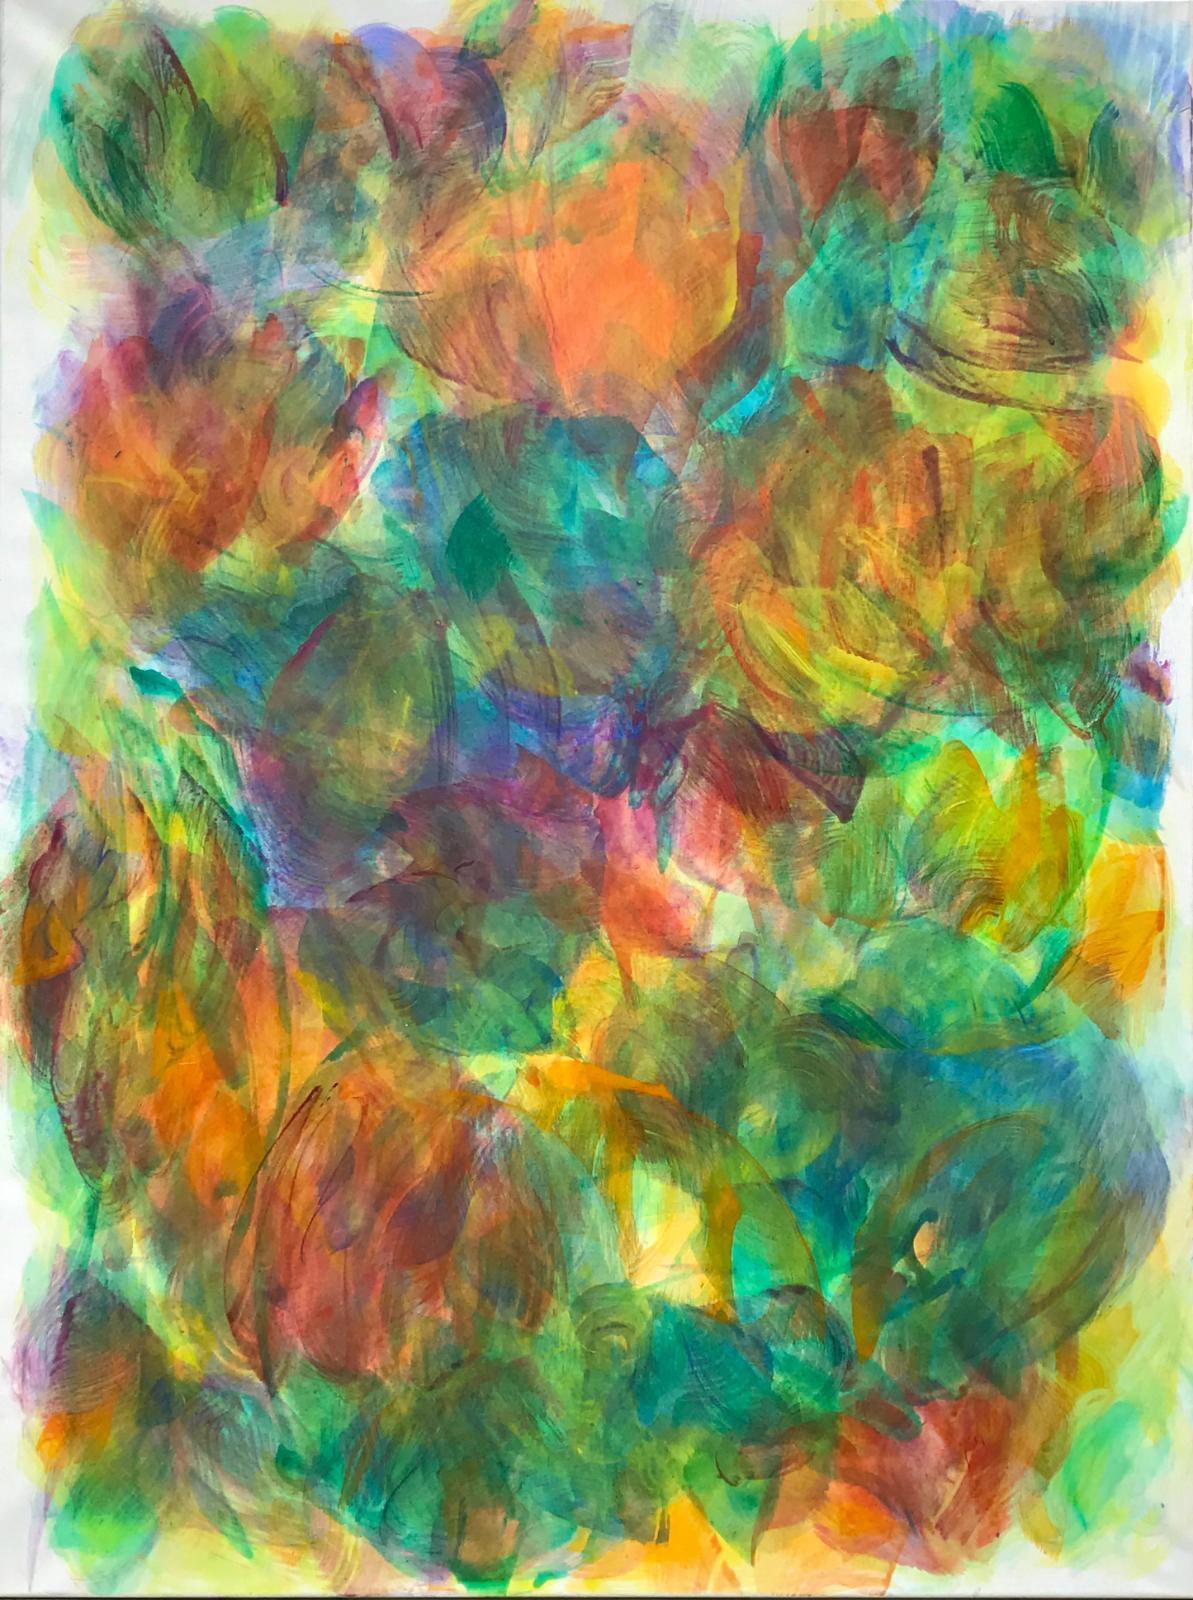 Hanspeter Münch, Ohne Titel, 11/2017, Acryl auf Leinwand, 175x135cm